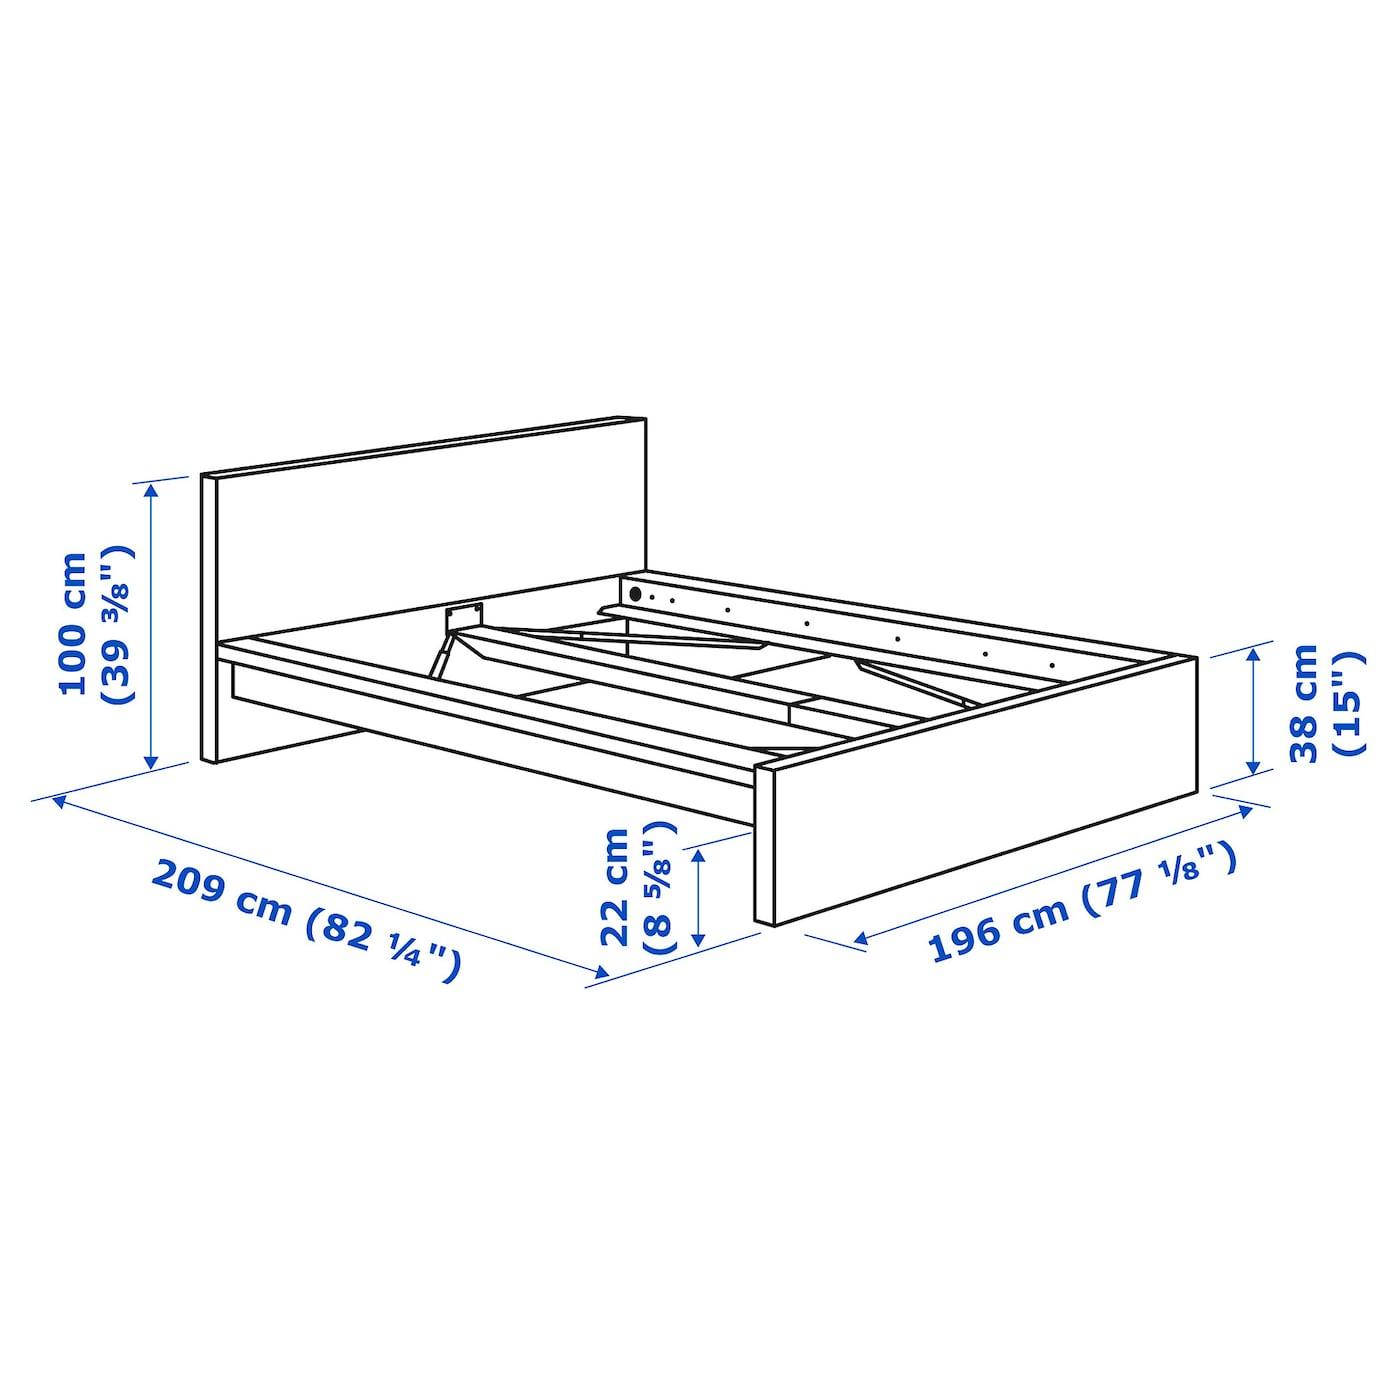 Malm Bettgestell Hoch Schwarzbraun Luroy Ikea Schweiz